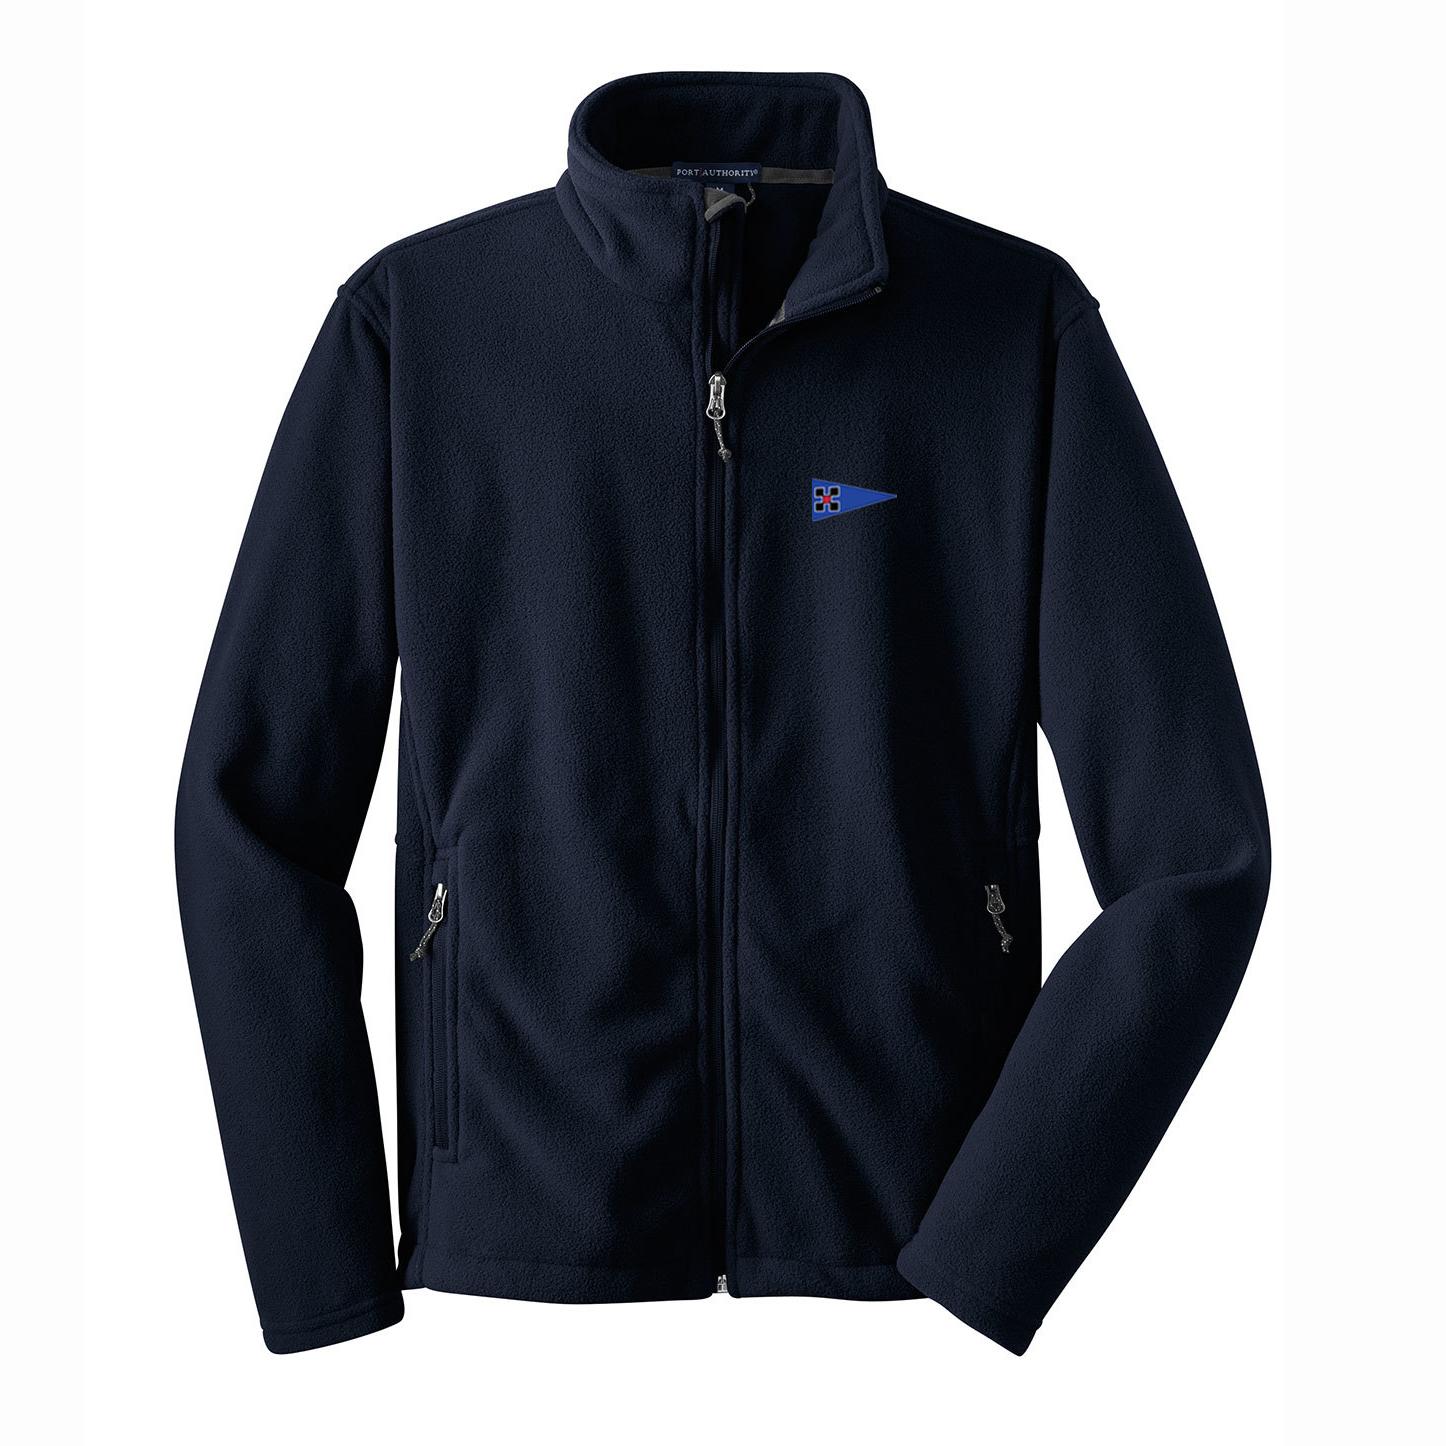 Castine Yacht Club - Men's PA Value Fleece Jacket